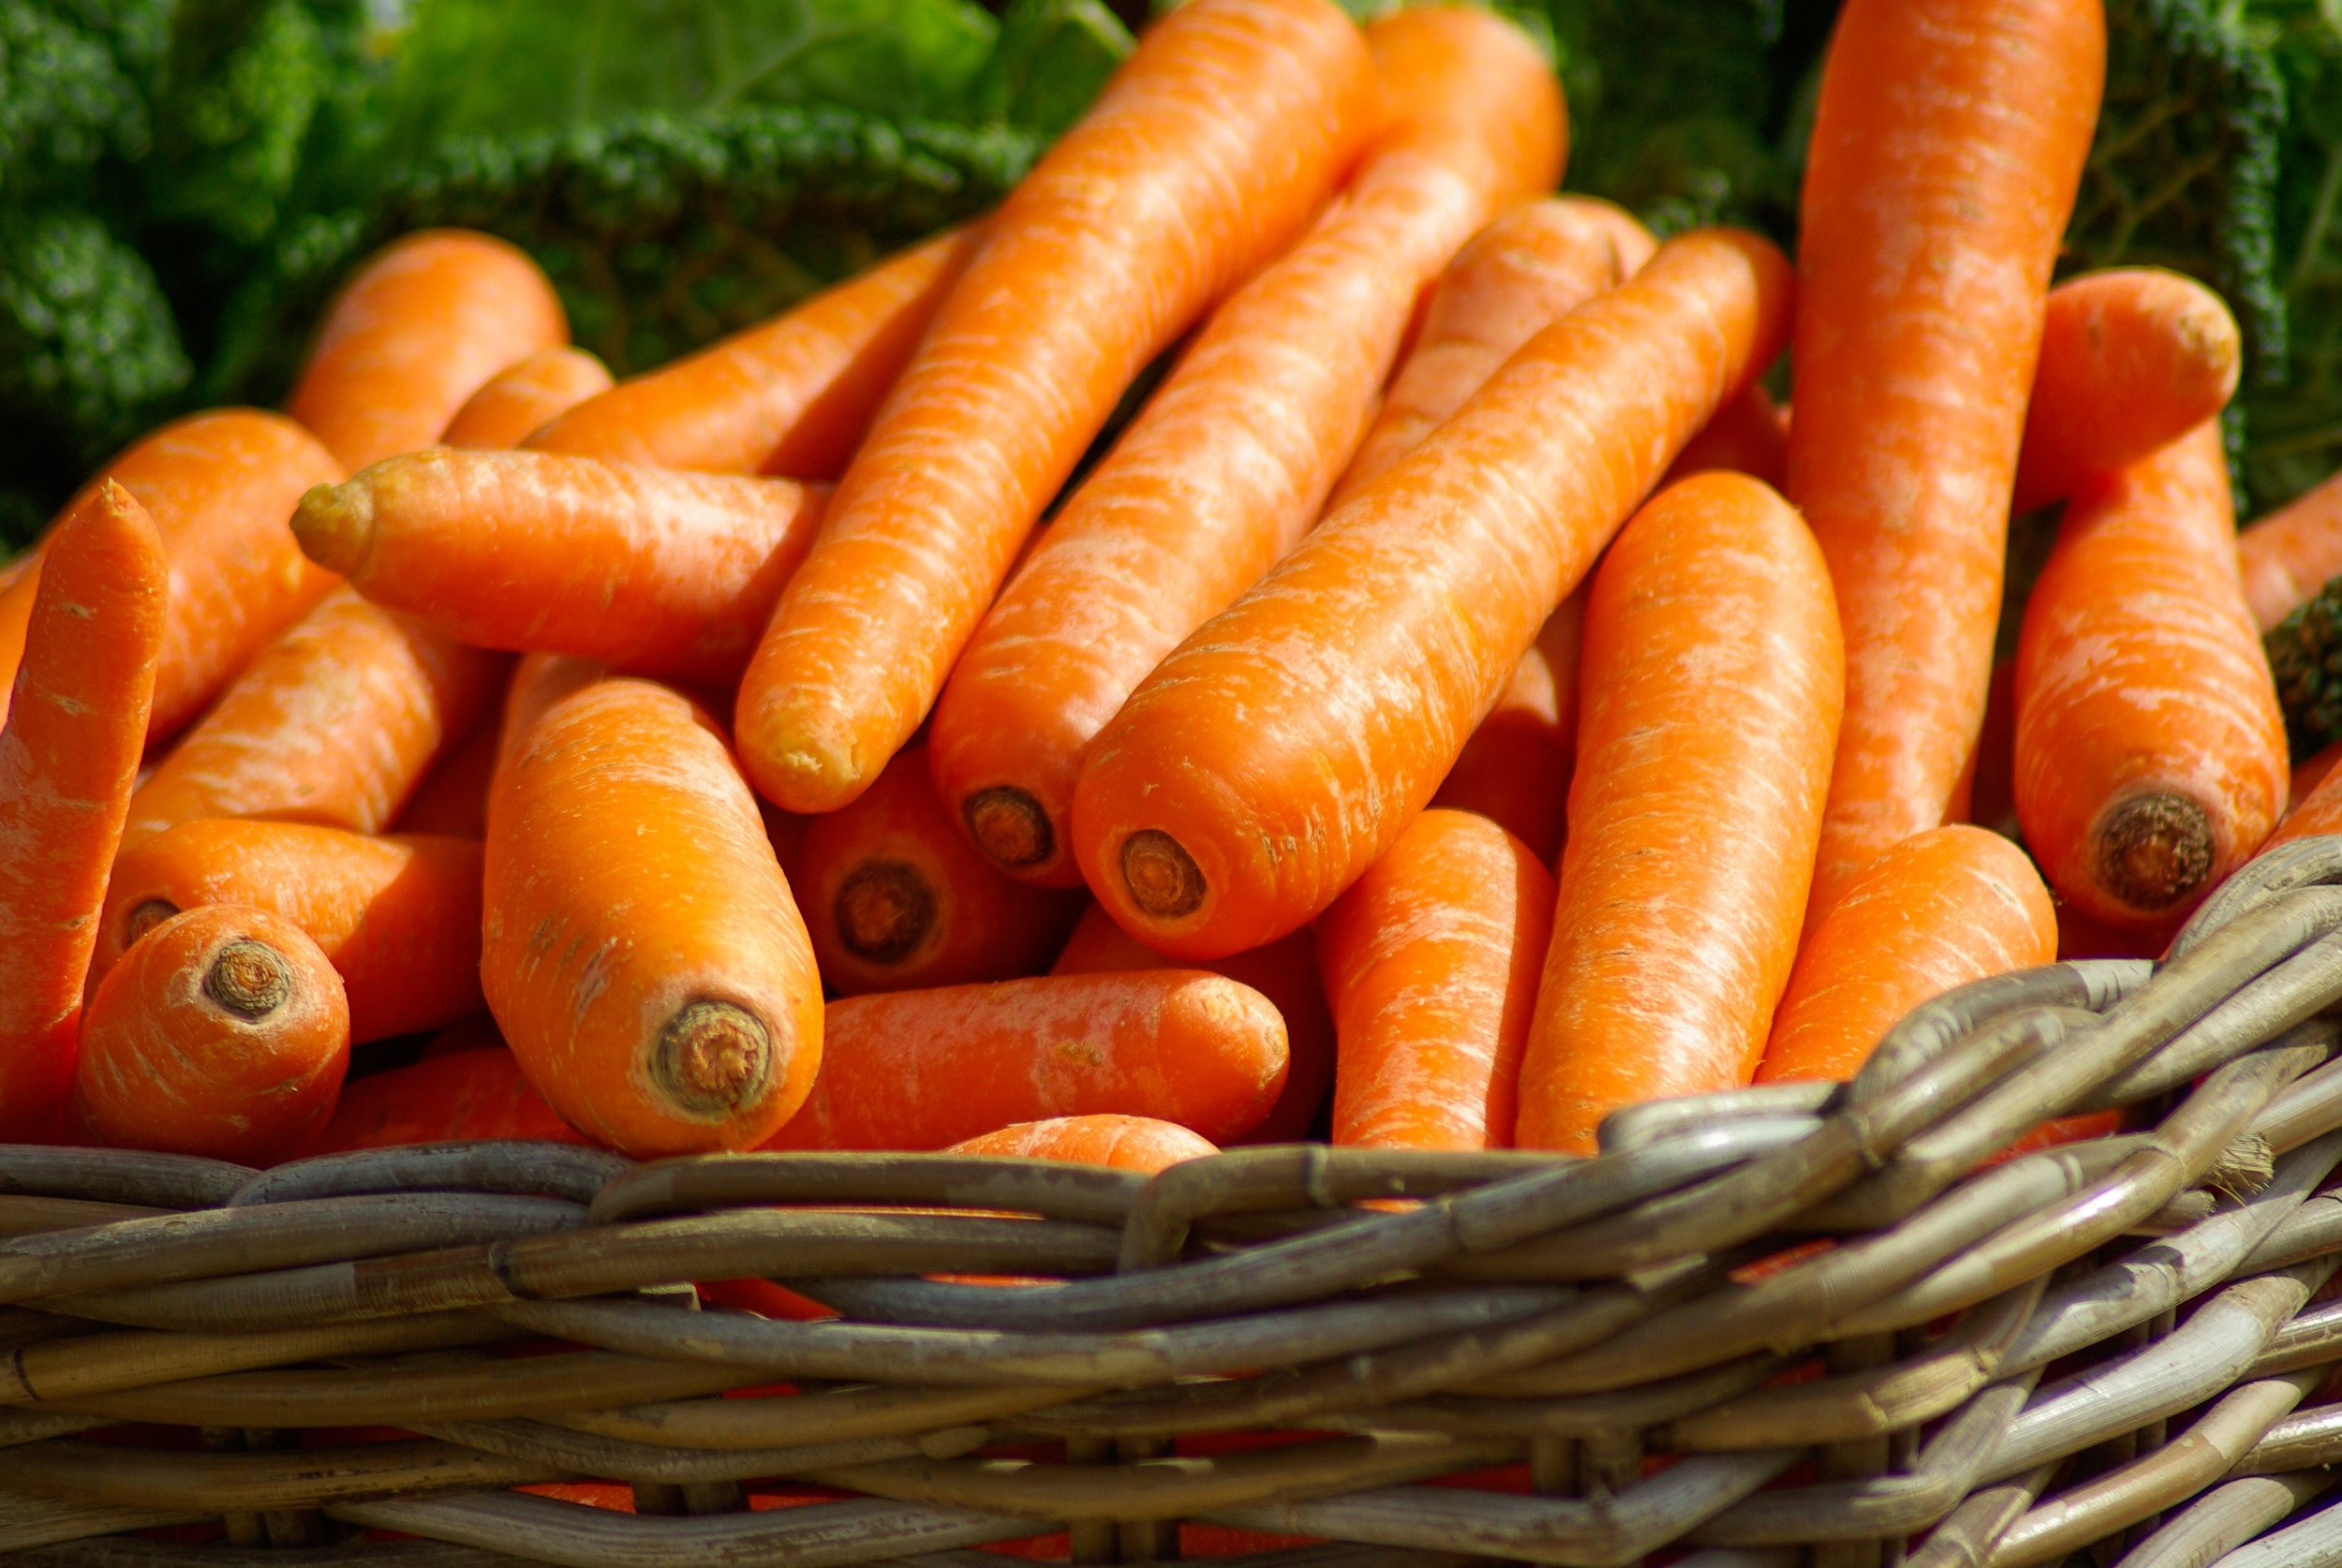 carrots-close-up-orange-37641.jpg